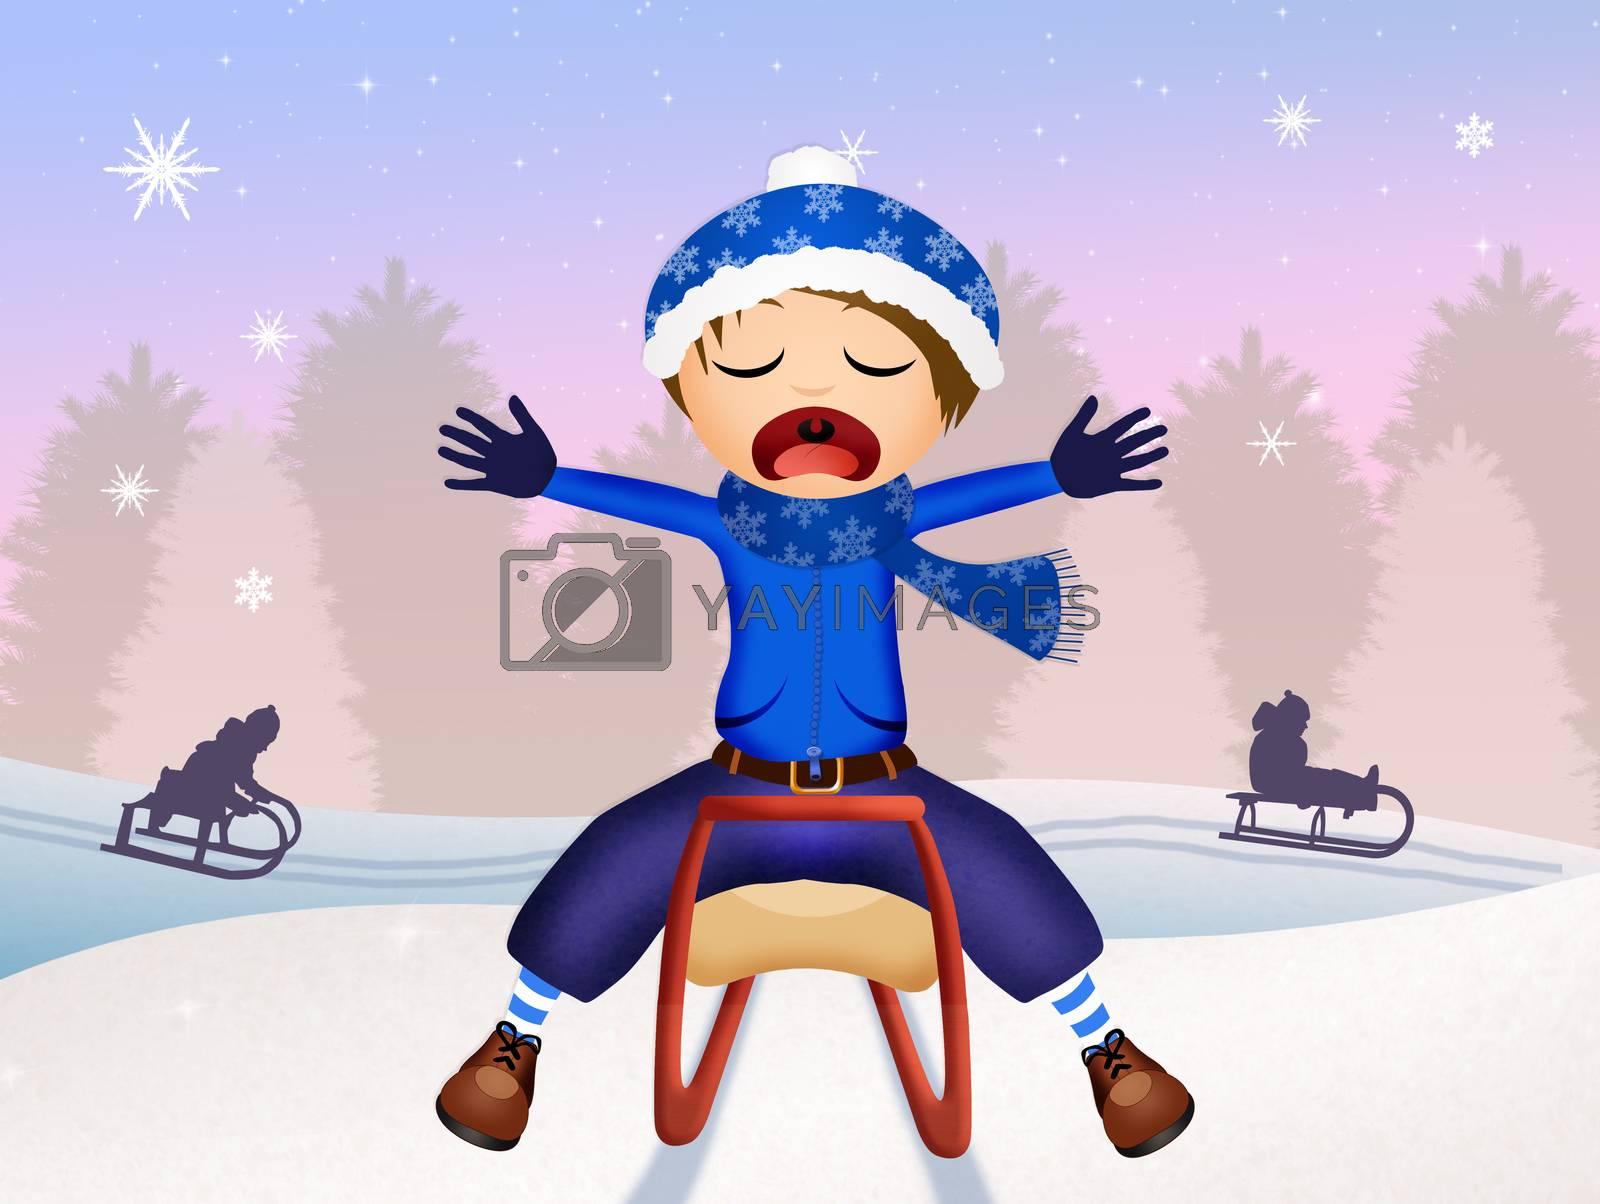 illustration of child on sleigh in winter